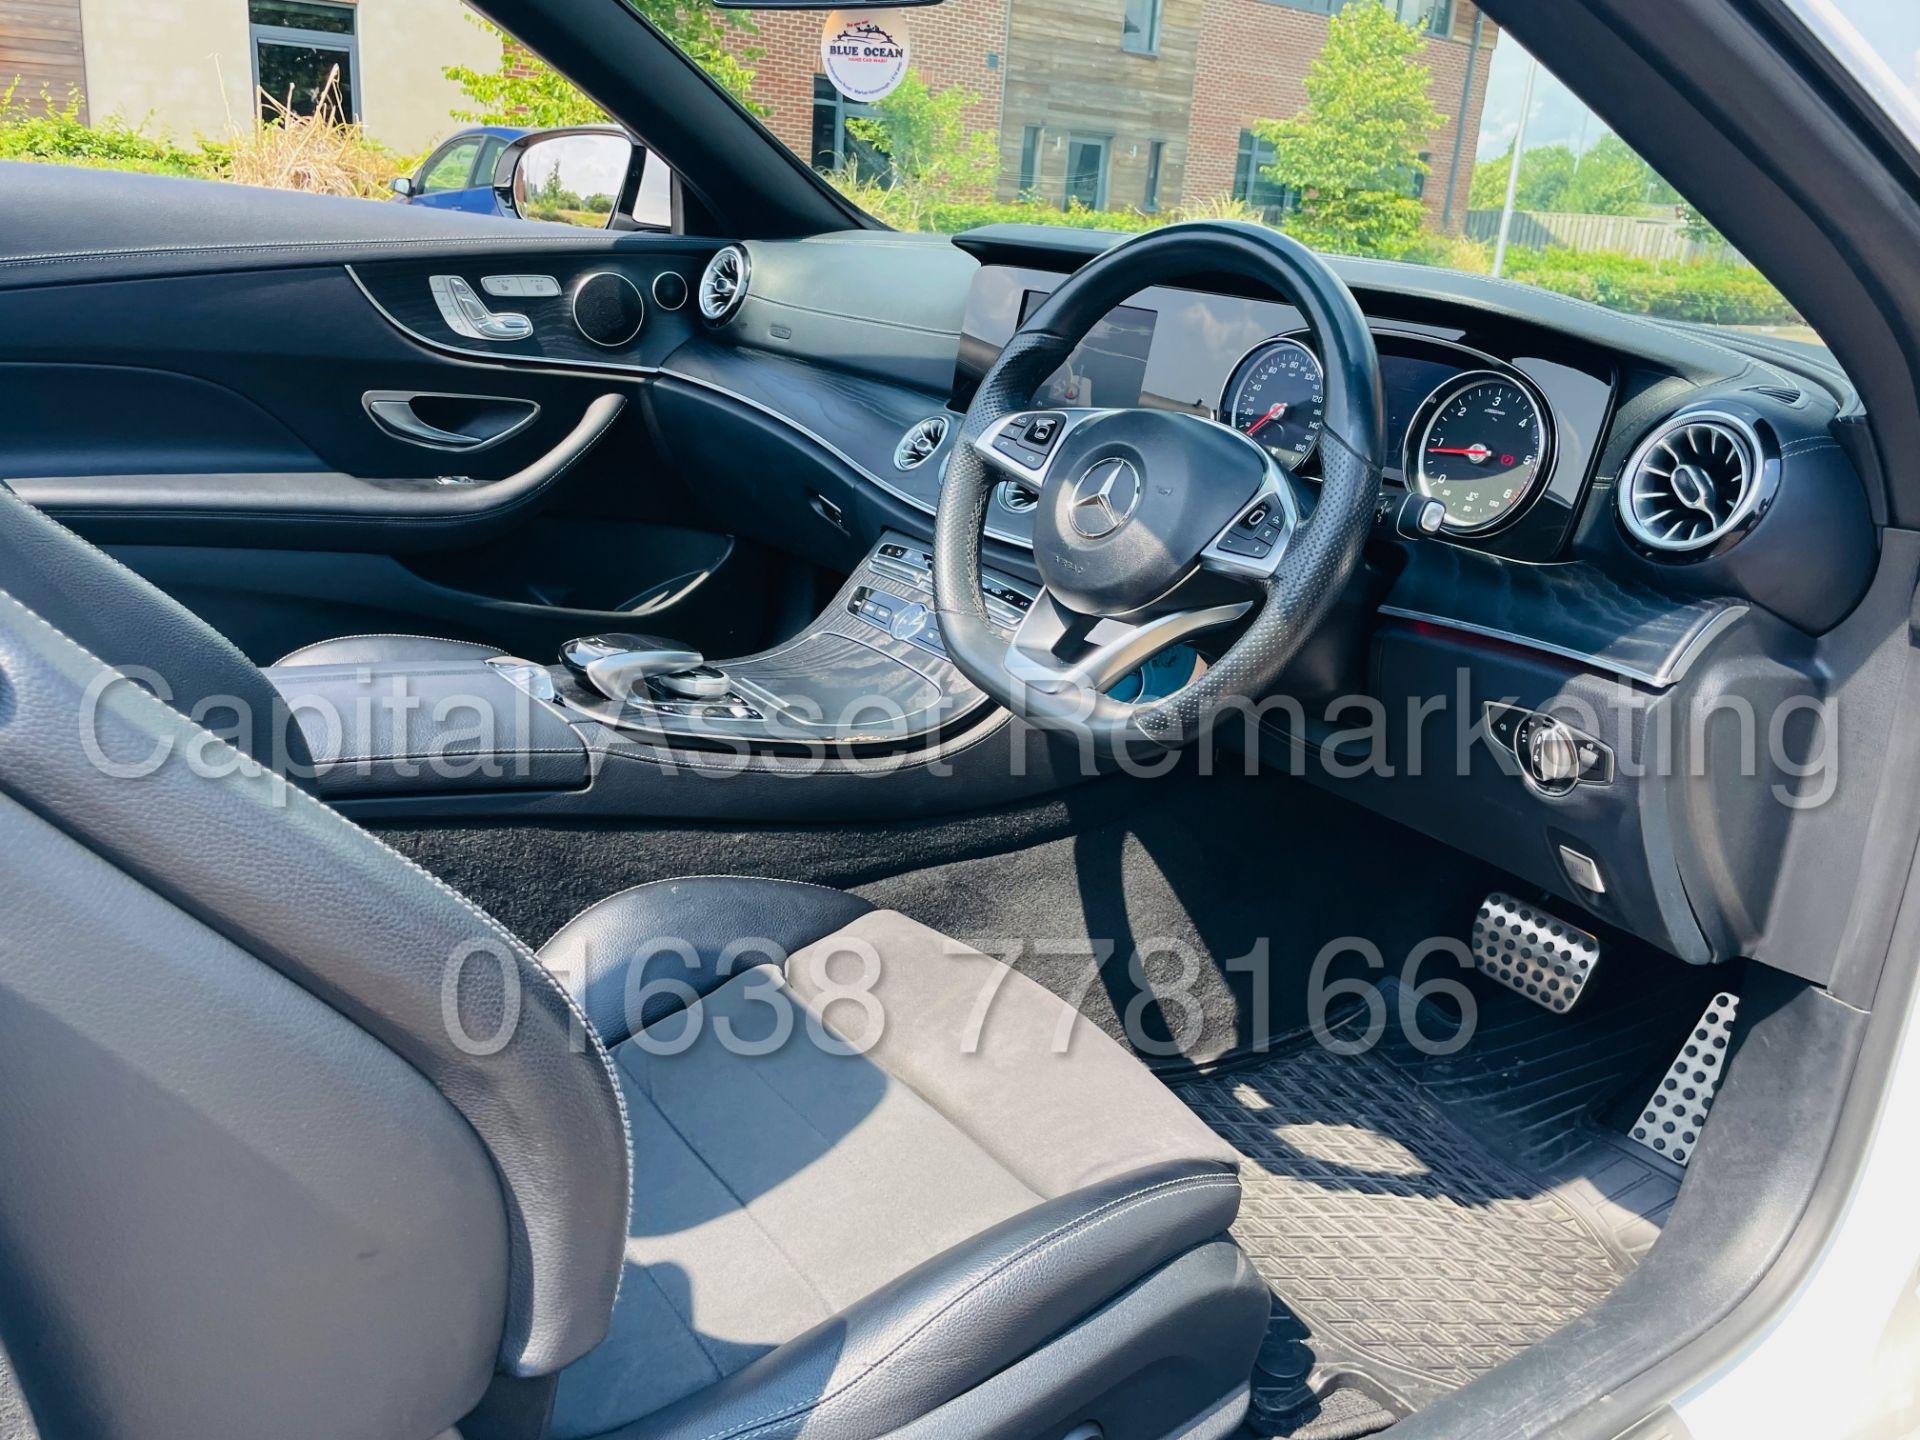 MERCEDES-BENZ E220d *AMG LINE PREMIUM - CABRIOLET* (2018 - EURO 6) '9G AUTO - LEATHER - SAT NAV' - Image 49 of 63